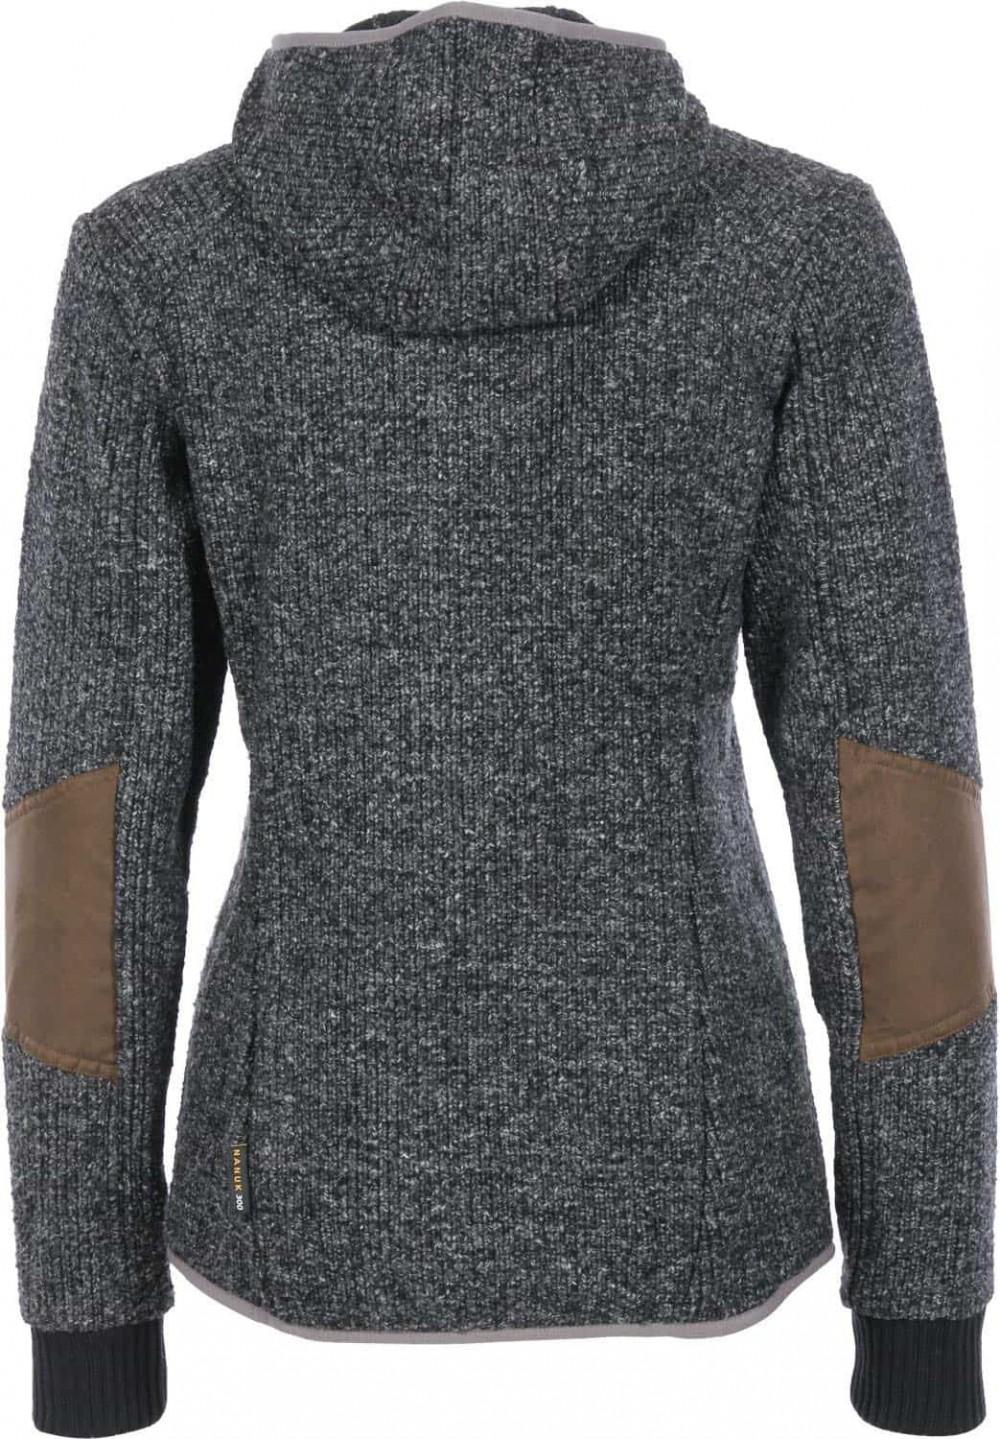 Кофта JACK WOLFSKIN milton fleece hoodie lady (размер 40-M/L) - 2